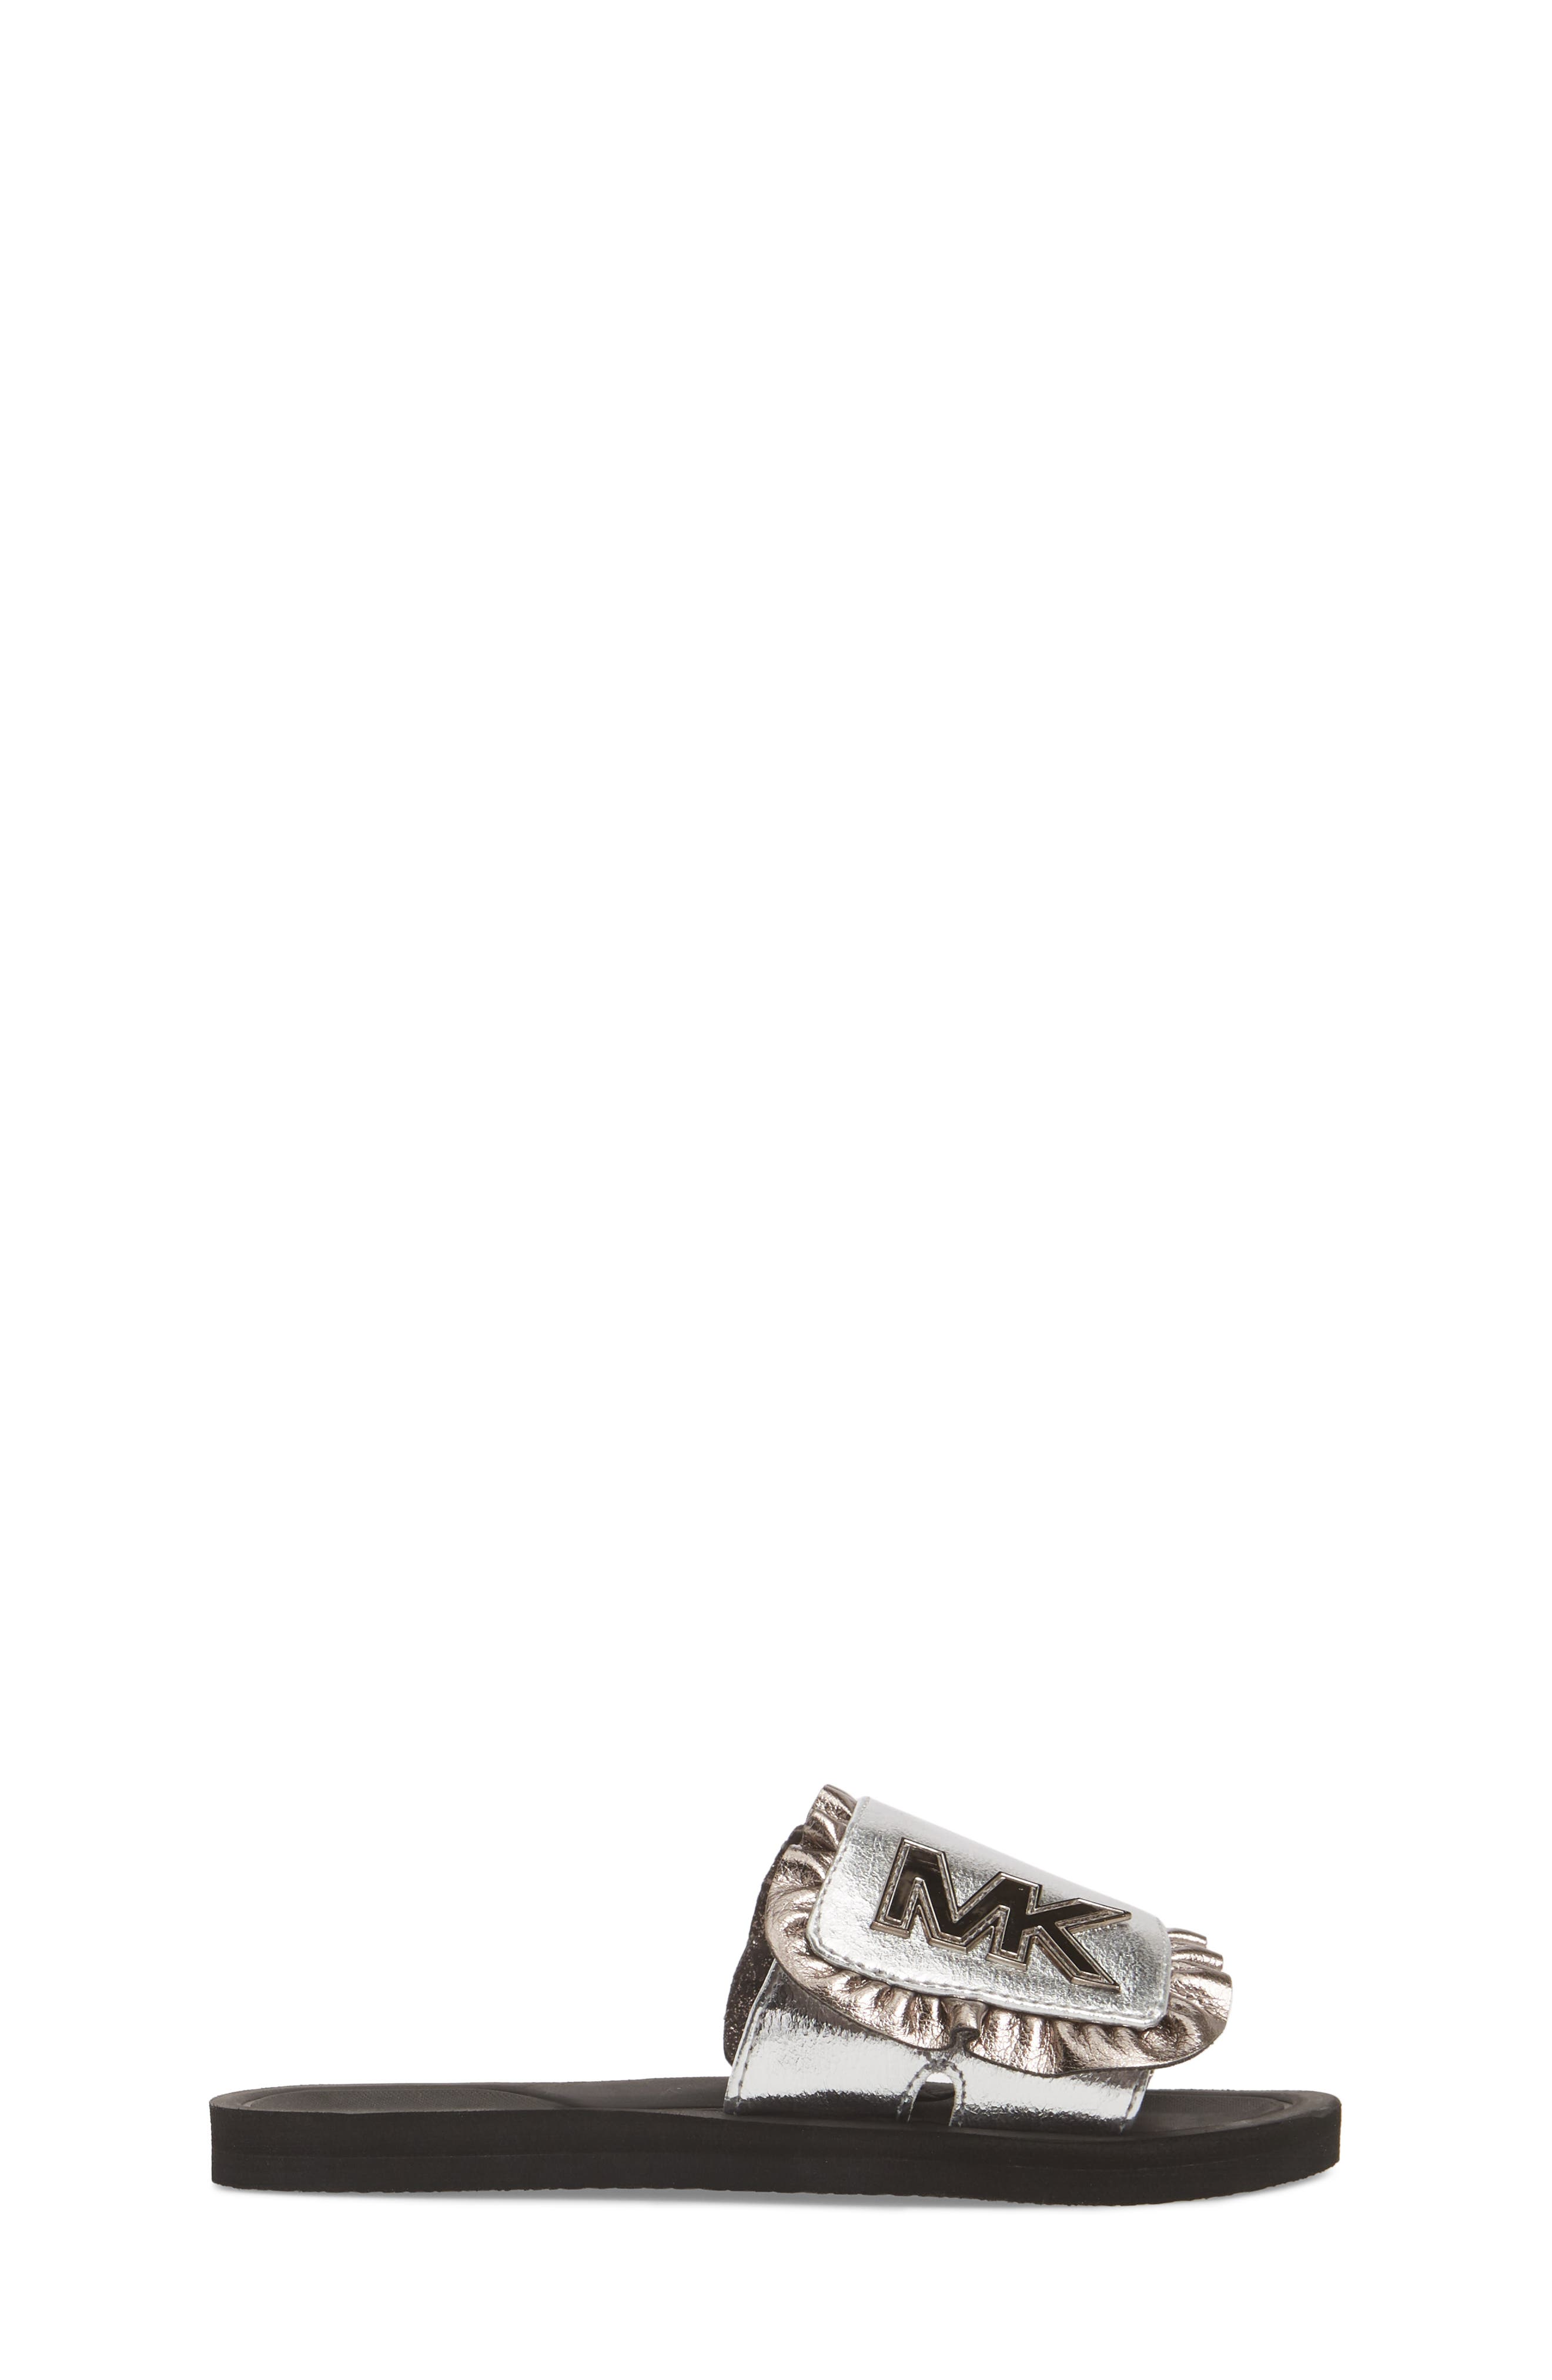 Eli Jack Metallic Slide Sandal,                             Alternate thumbnail 3, color,                             Silver